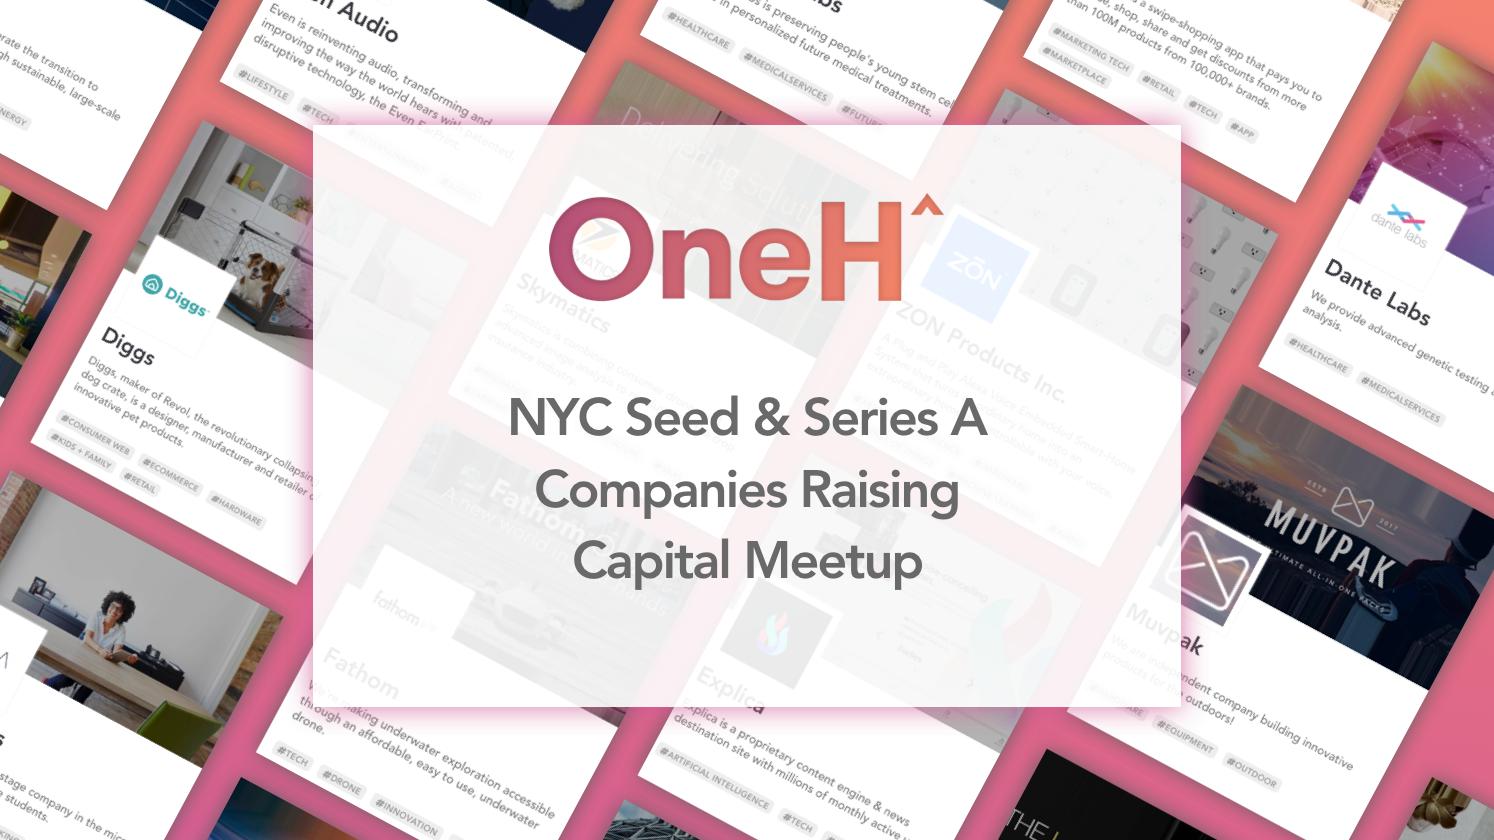 New York Seed & Series A Companies Raising Capital